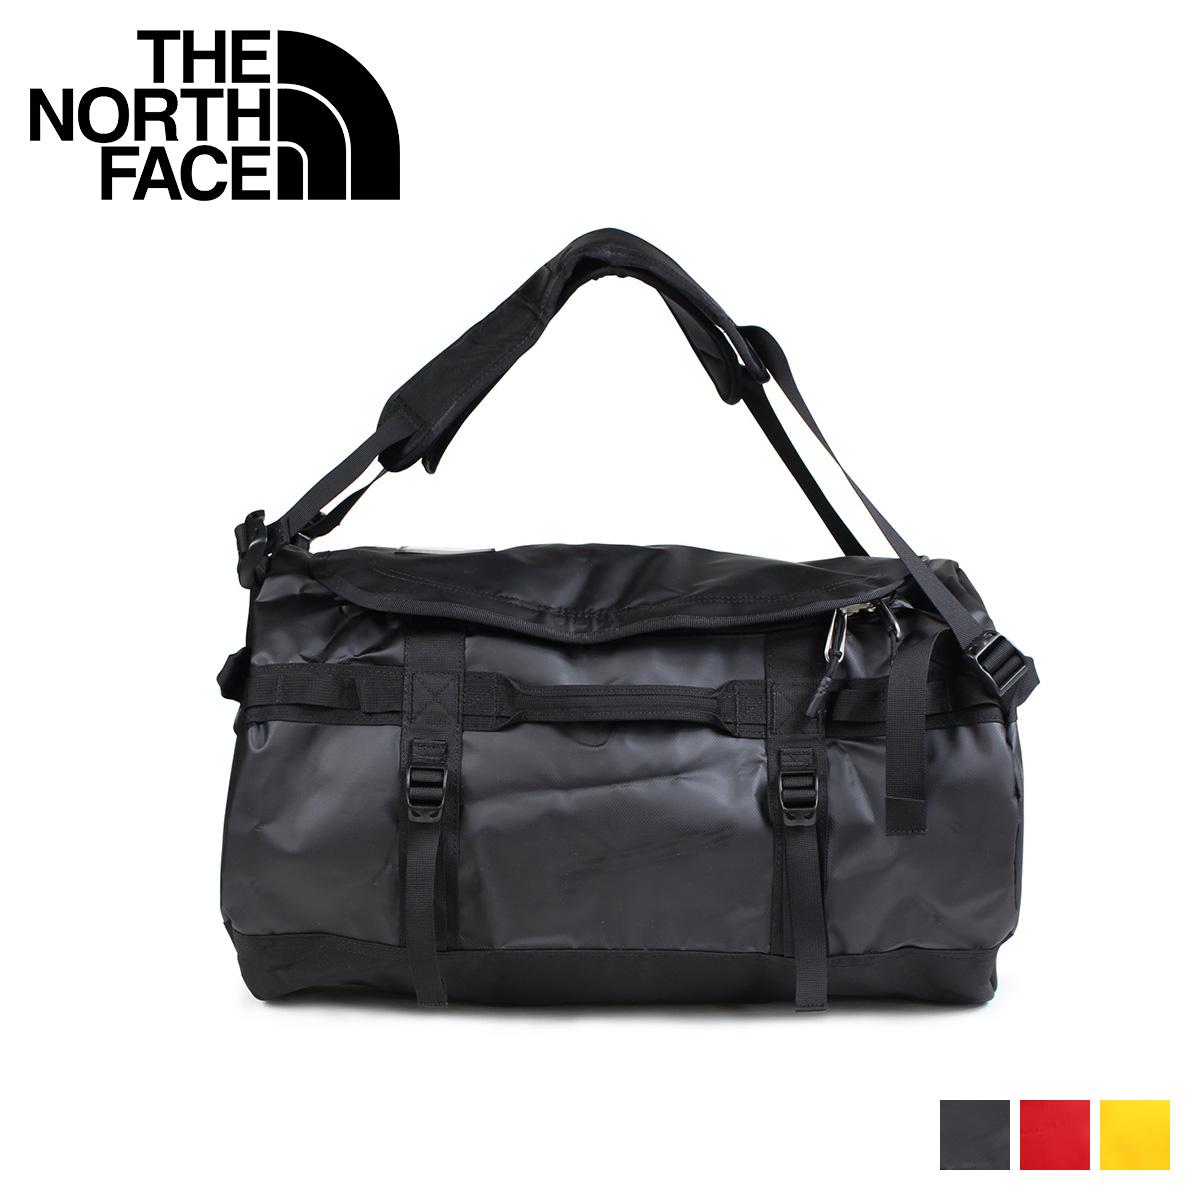 bbd1076e6 THE NORTH FACE North Face bag Boston bag duffel bag men BASE CAMP DUFFEL S  T93ETOJK3 black black